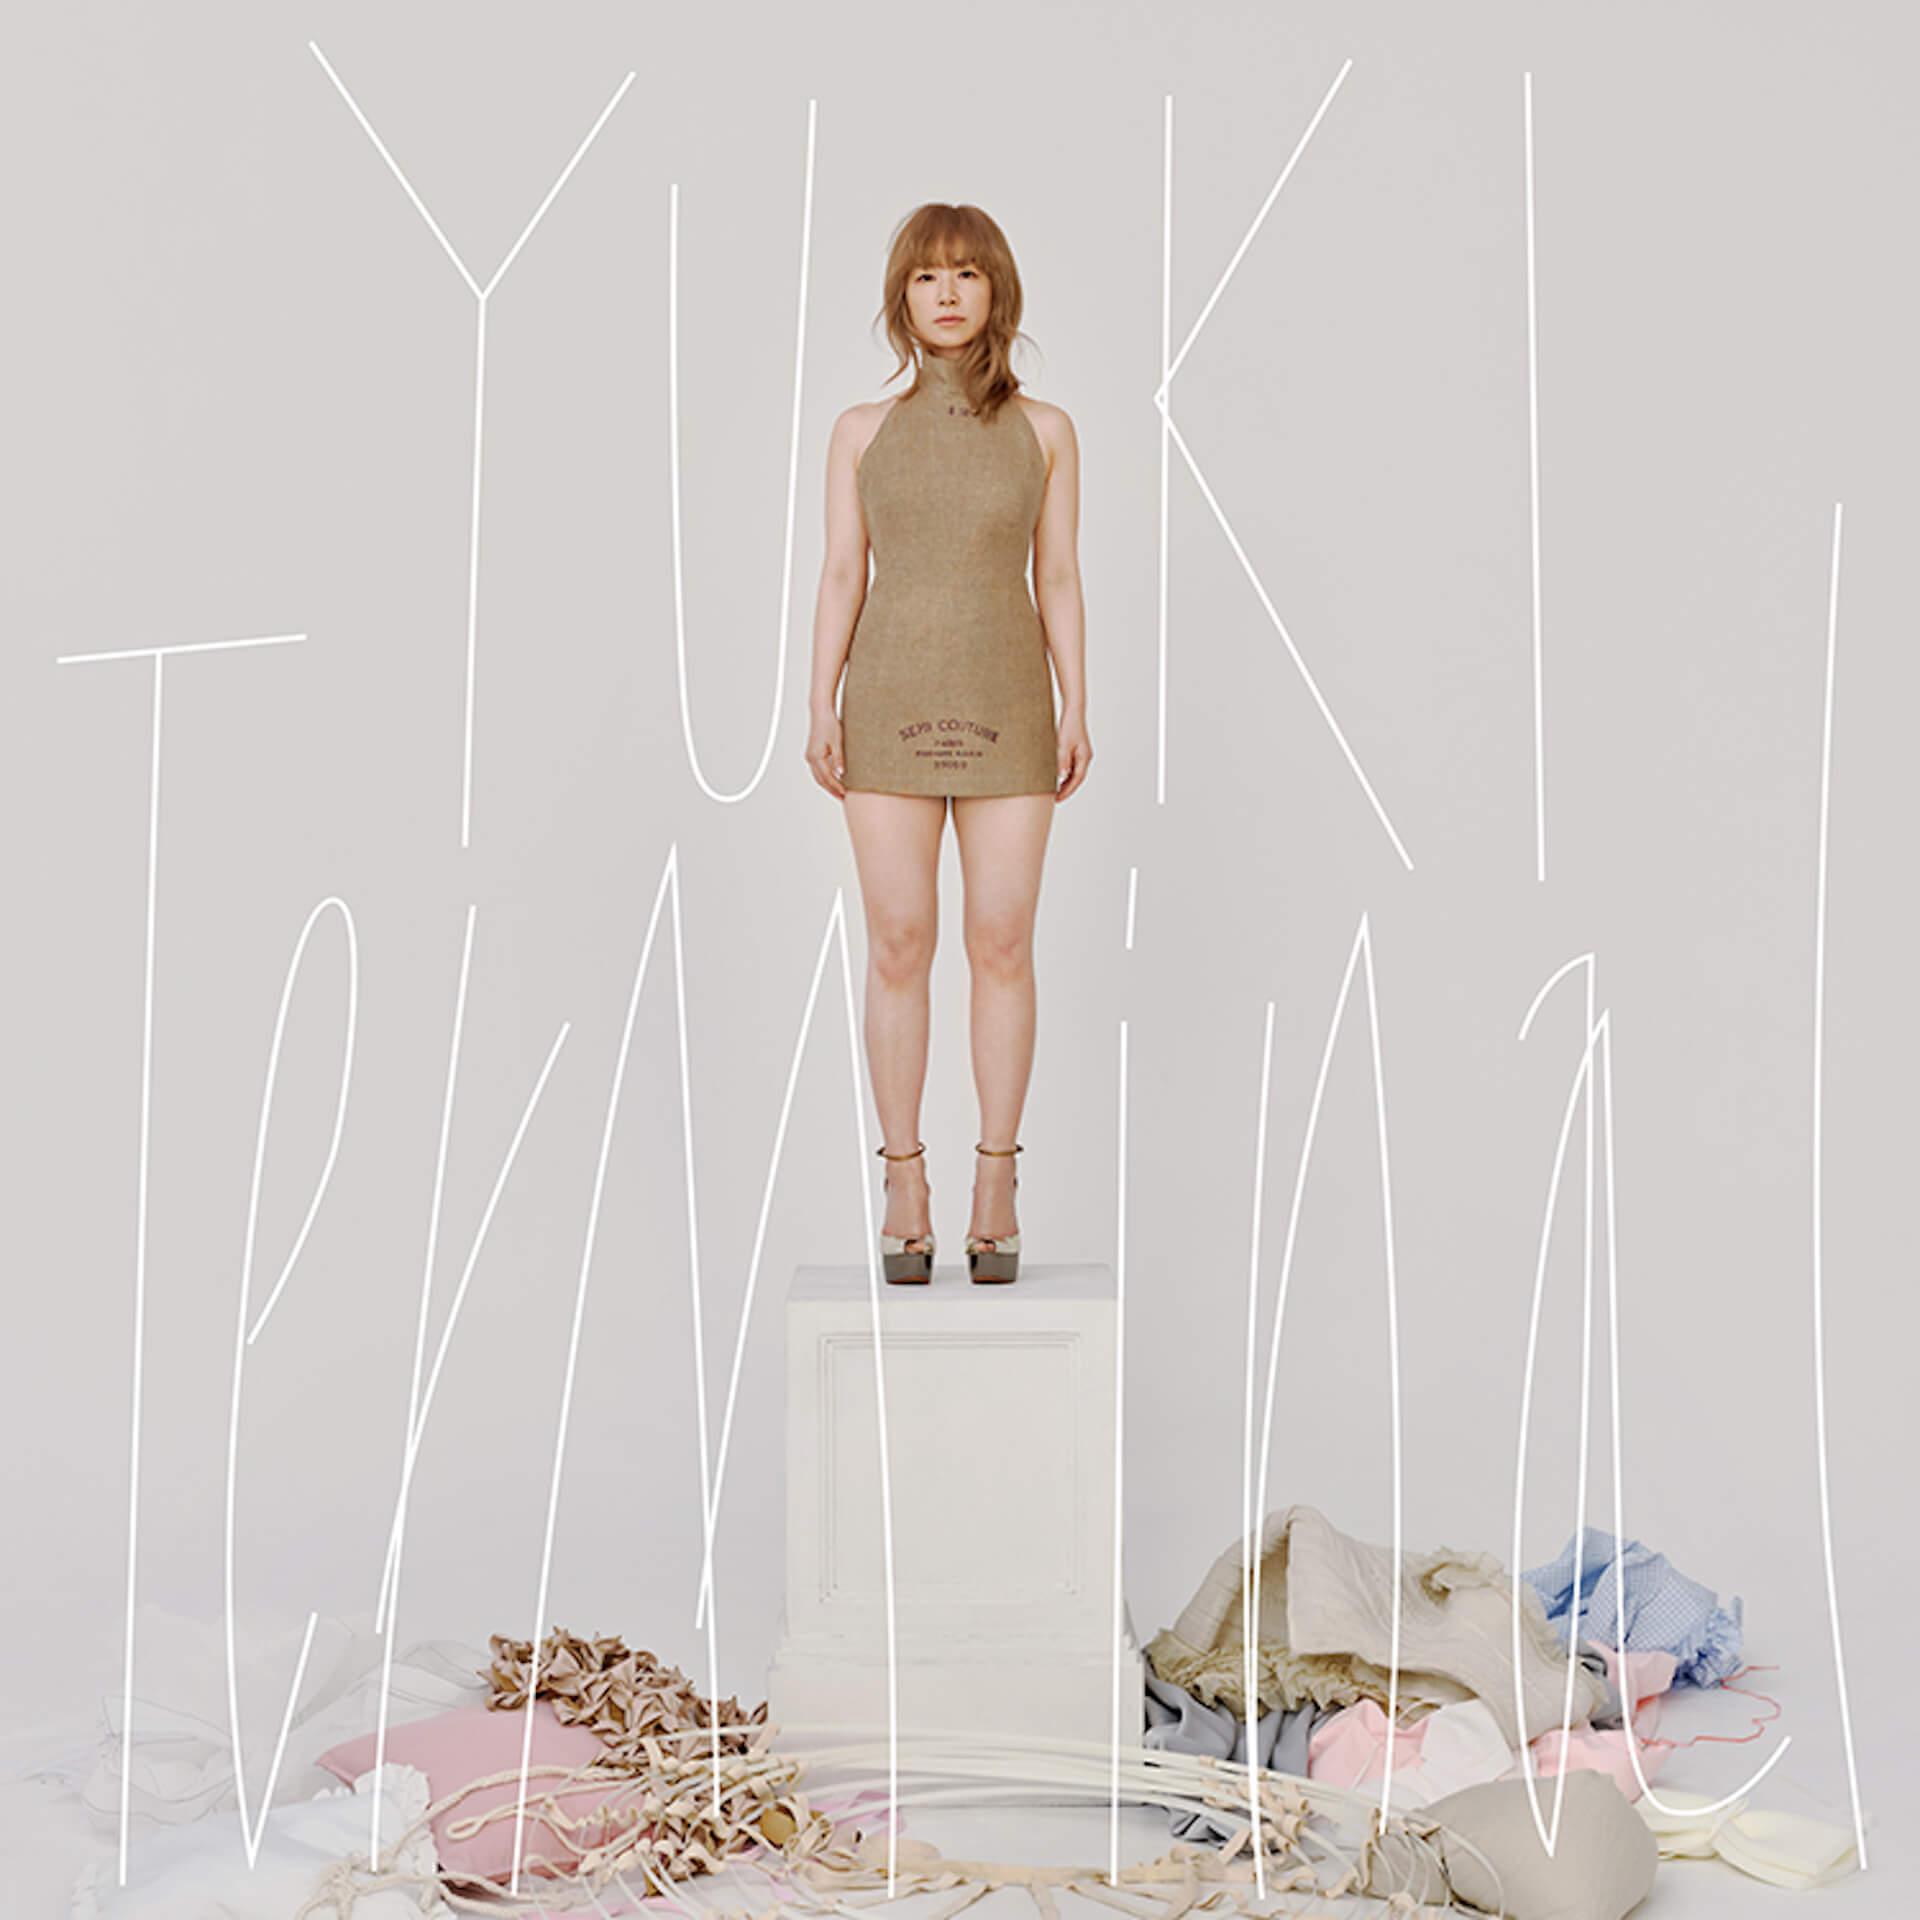 "YUKIのニューアルバム『Terminal』収録""My lovely ghost""のMVティザー映像が解禁!ラジオ出演も決定 music210415_yuki_4"